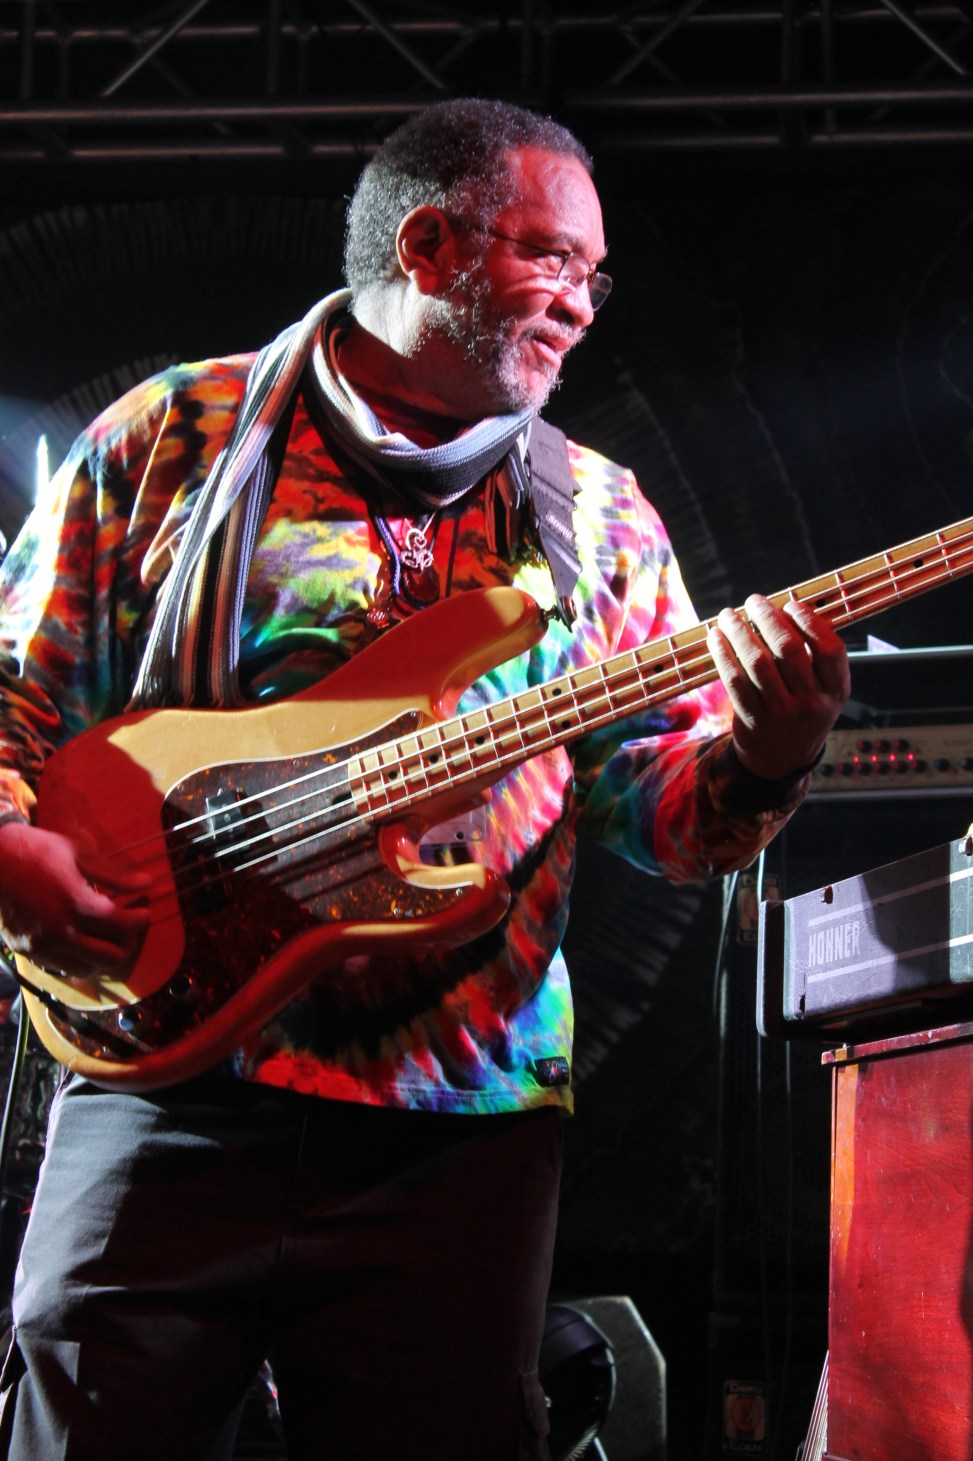 Funk Jam - George Porter Jr. (The Meters) - Photo by Chris Horton